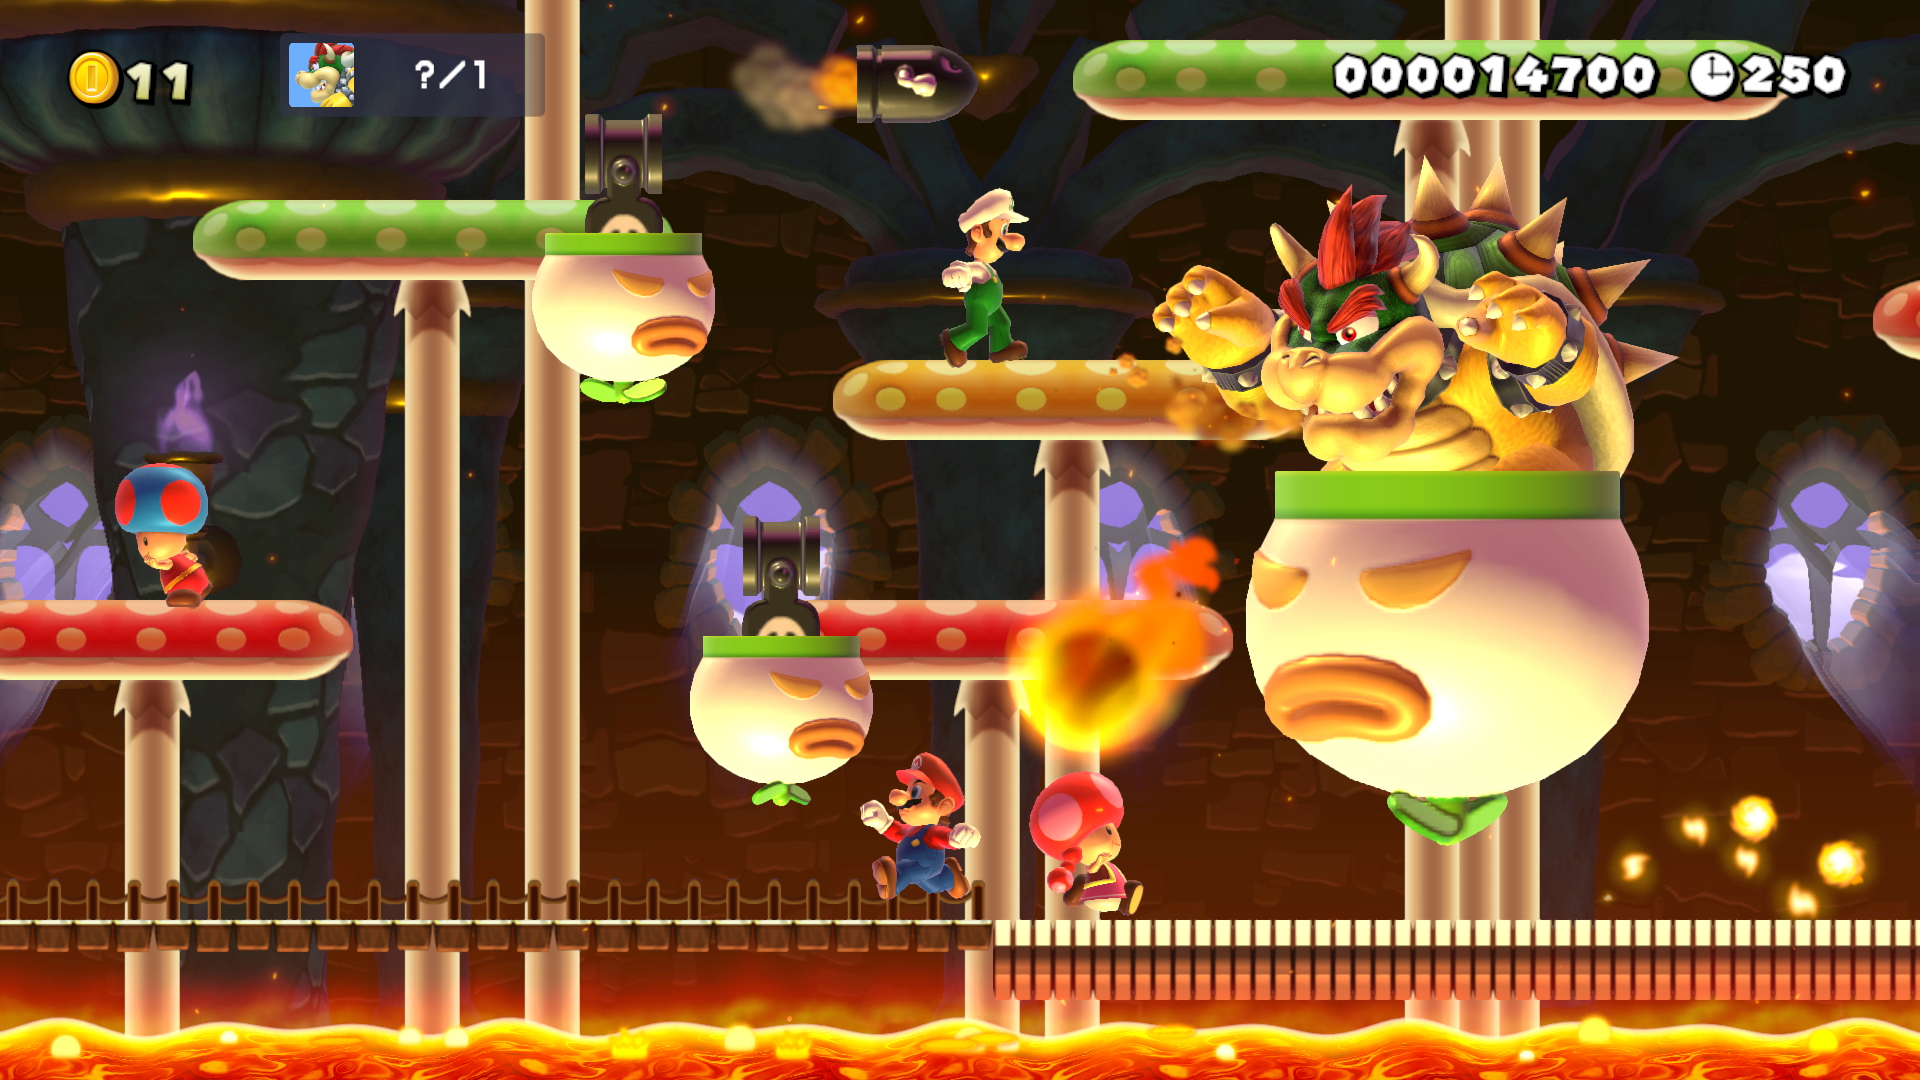 Nintendo Will Add Friend Matching To Mario Maker 2 Online Play